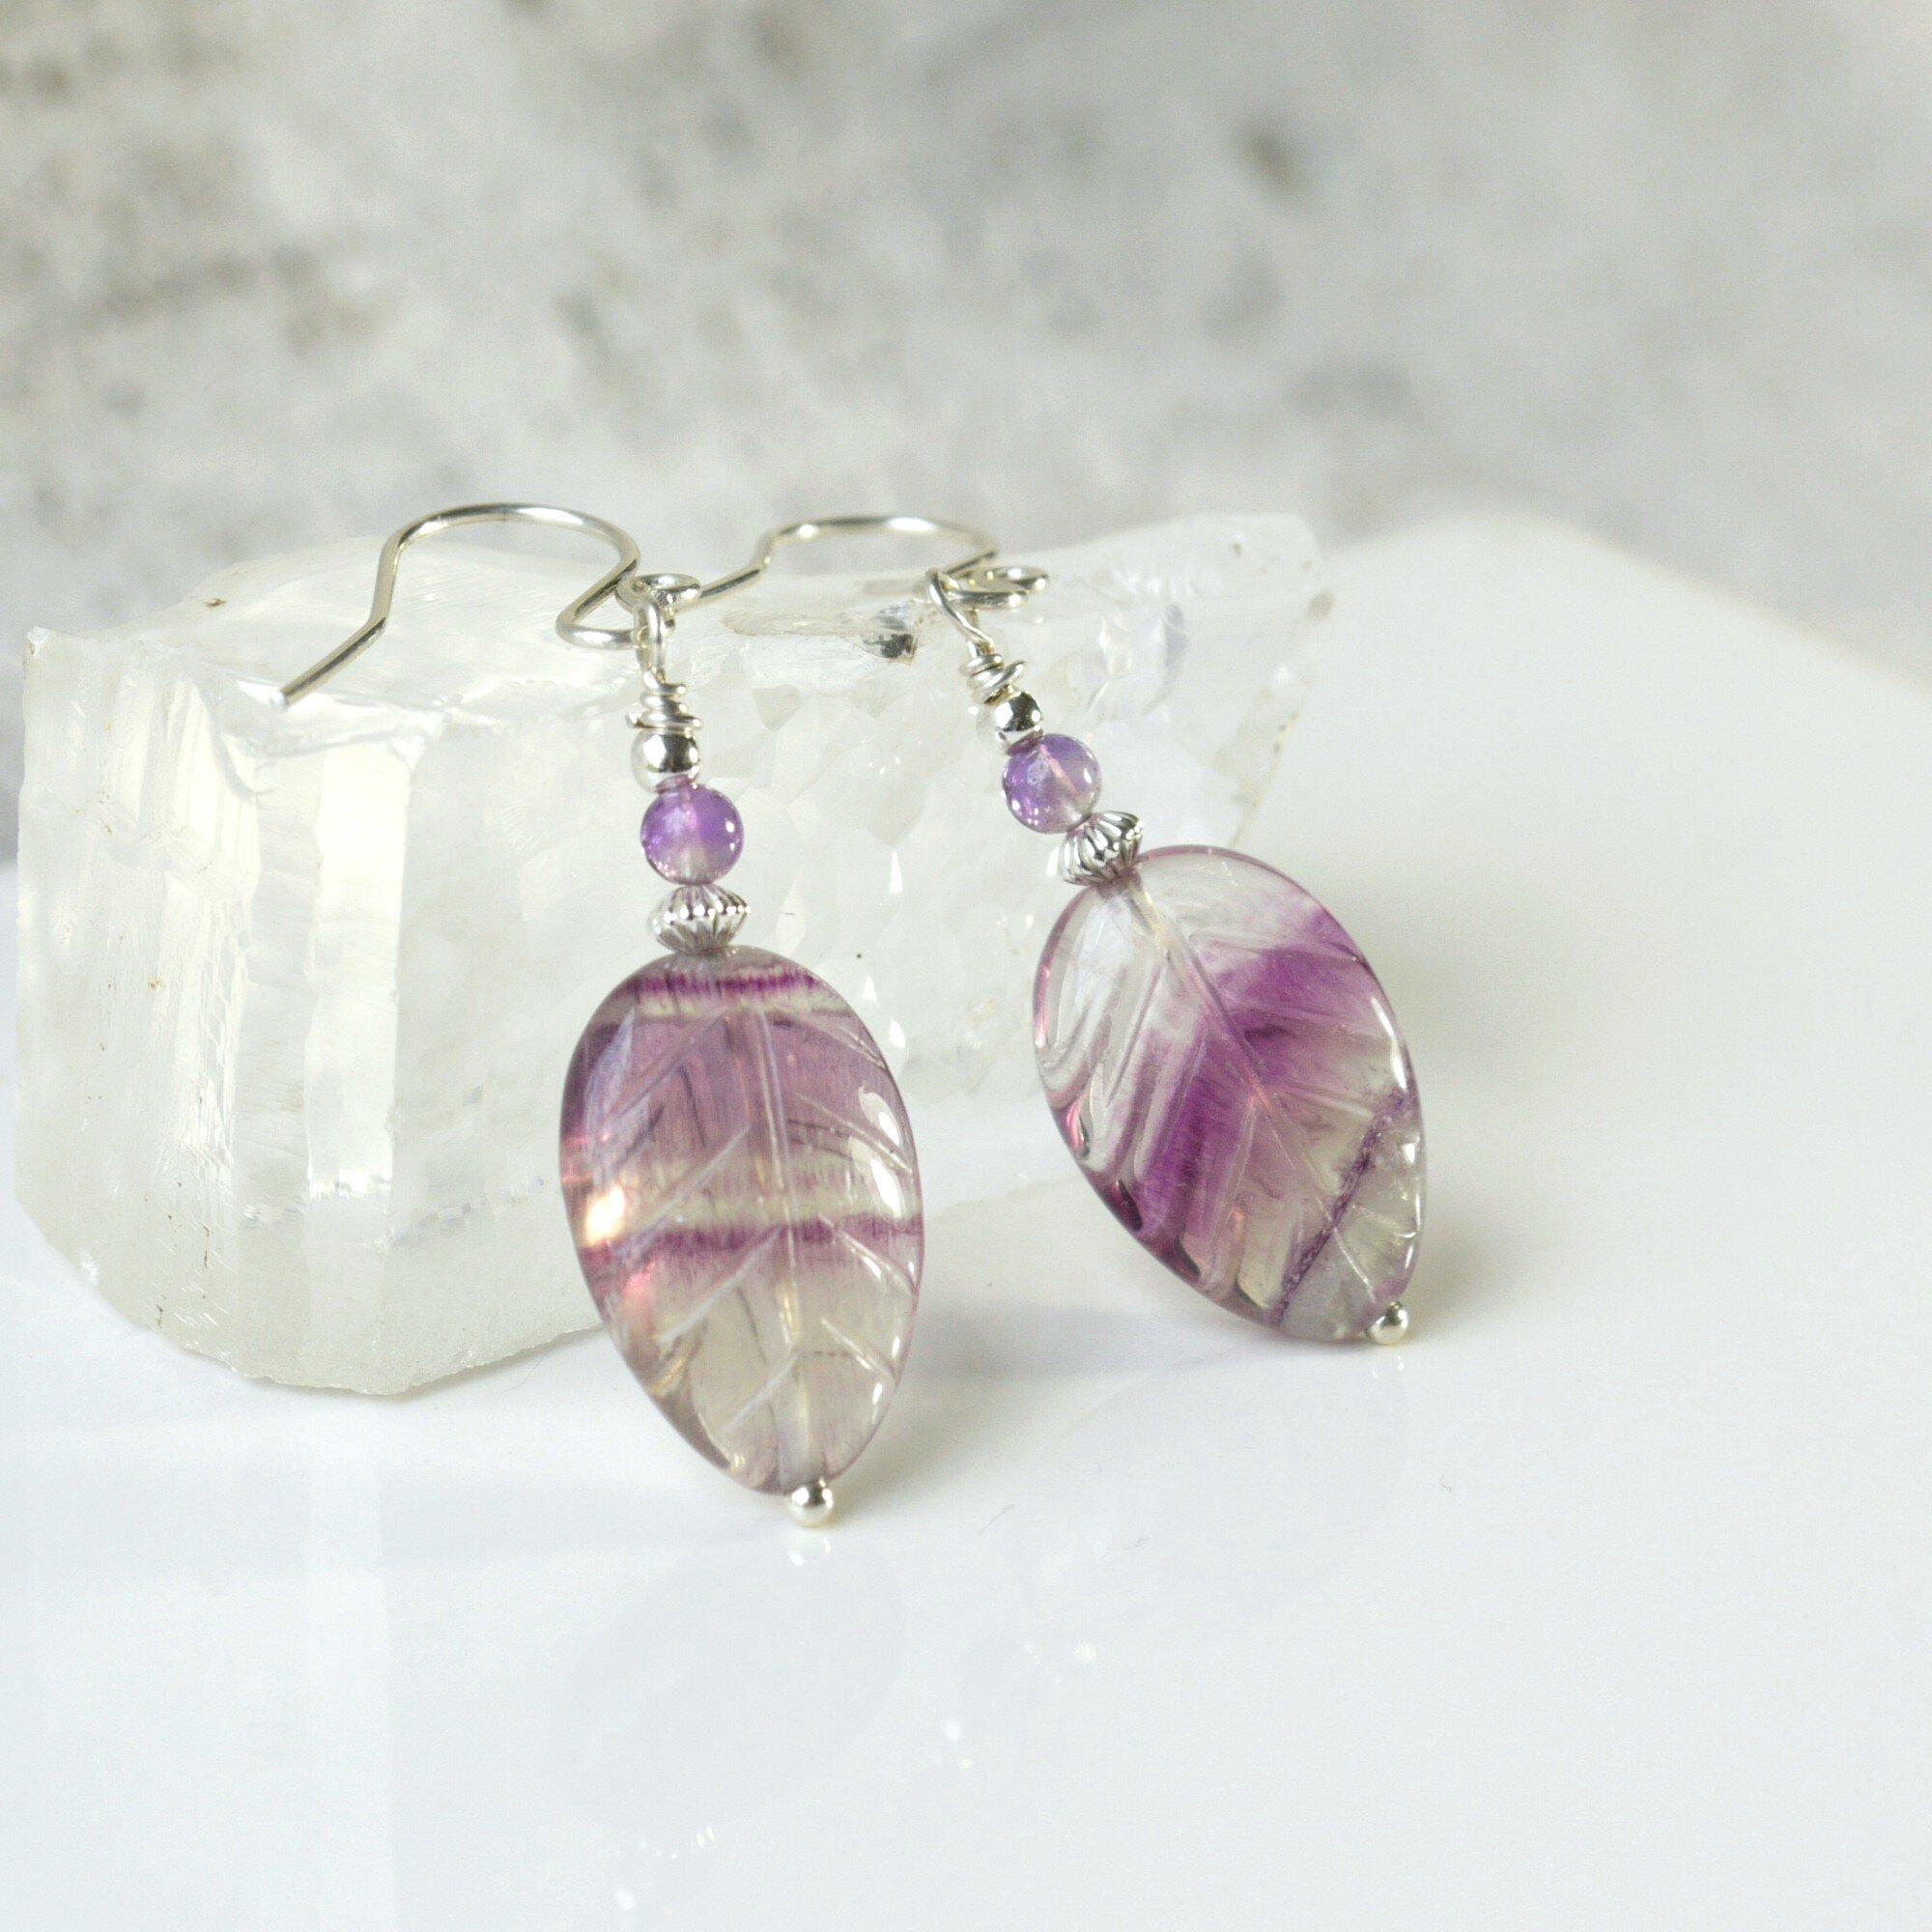 ad4307407778d Sterling Silver Purple Amethyst & Rainbow Fluorite Leaf Earrings - Iris Elm  Jewelry | Unique Artisan Handmade Bohemian and Vintage Style Earrings, ...